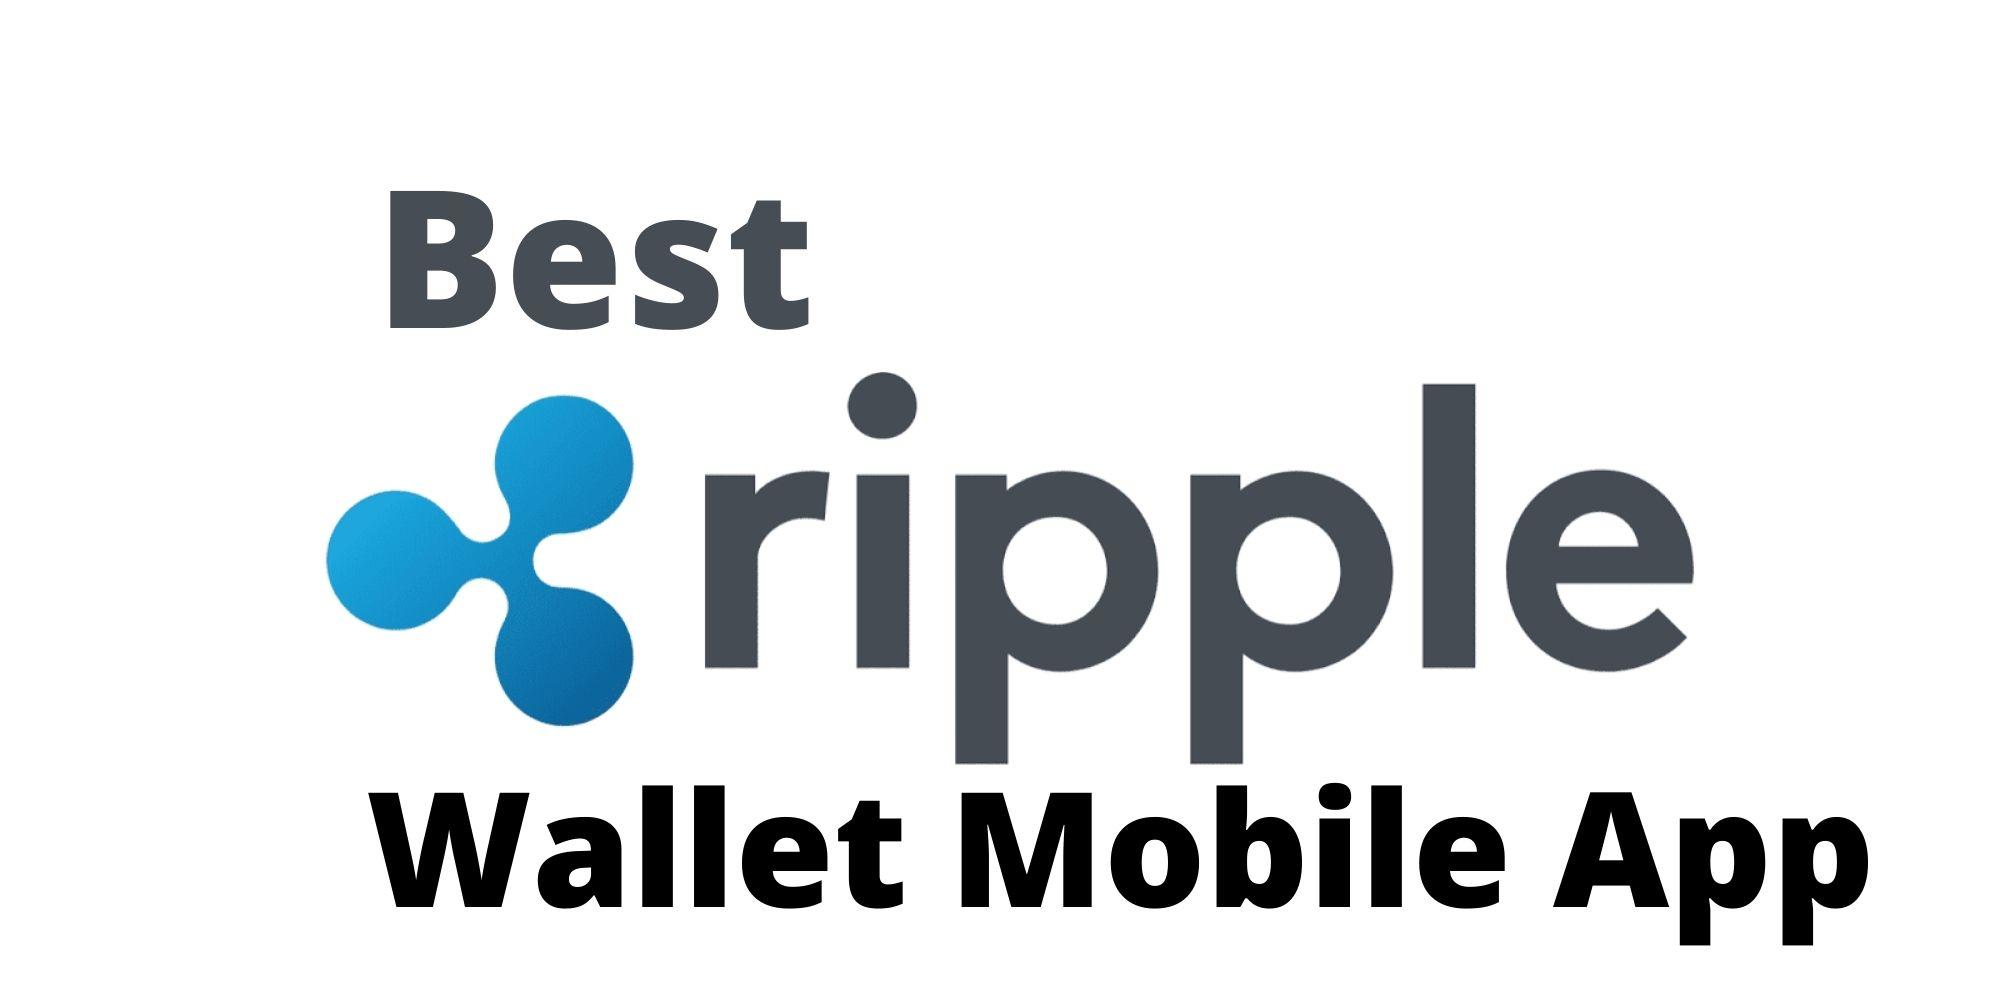 best ripple wallet mobile app